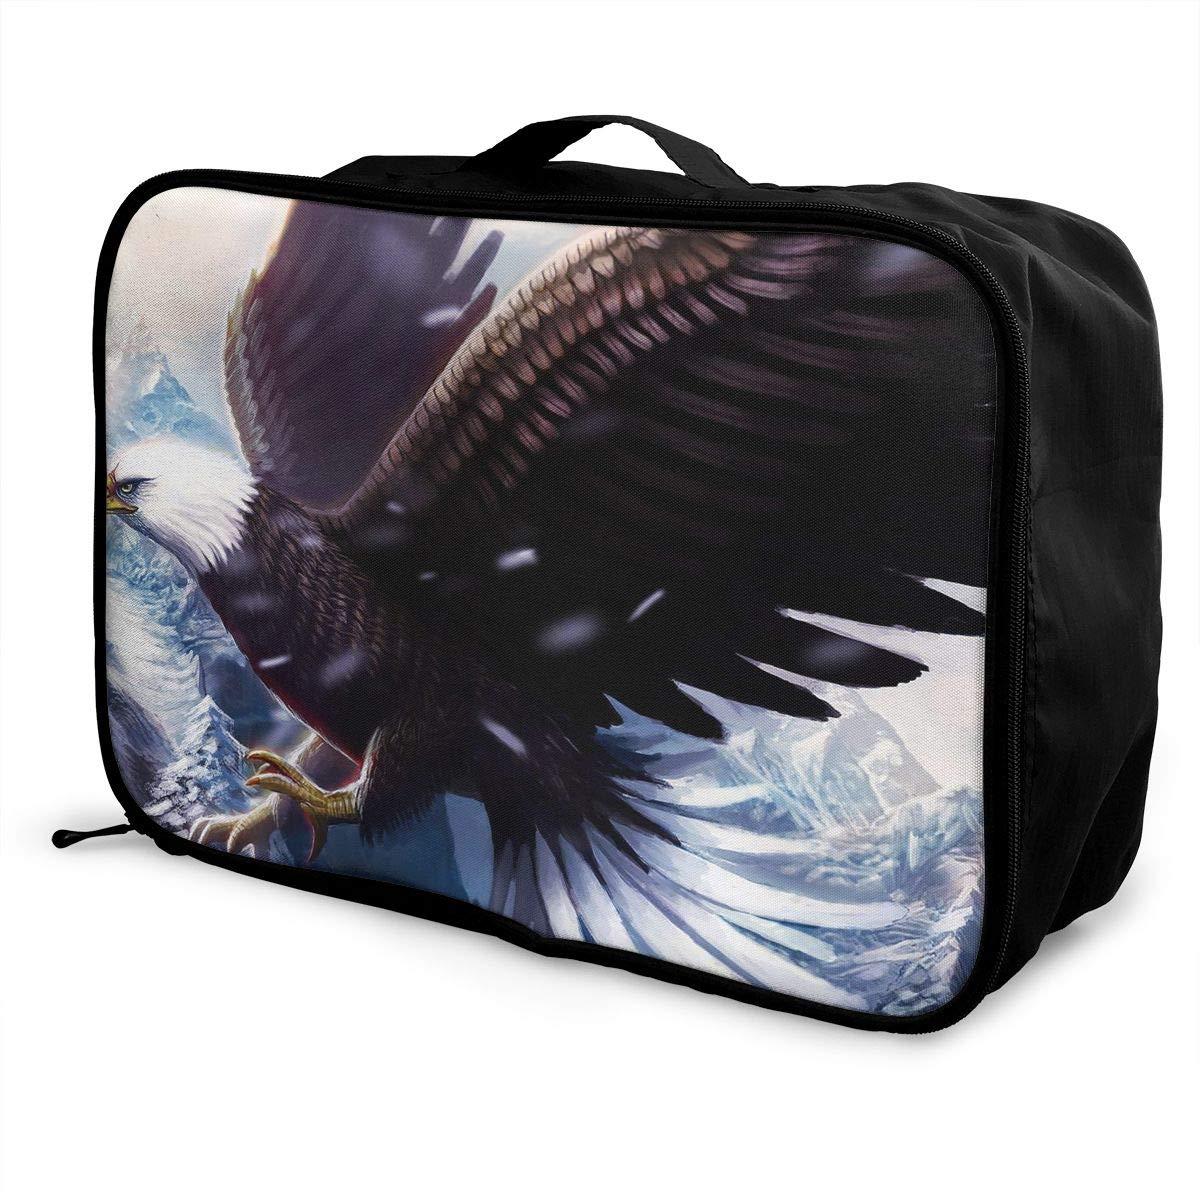 Travel Luggage Duffle Bag Lightweight Portable Handbag Eagle Large Capacity Waterproof Foldable Storage Tote